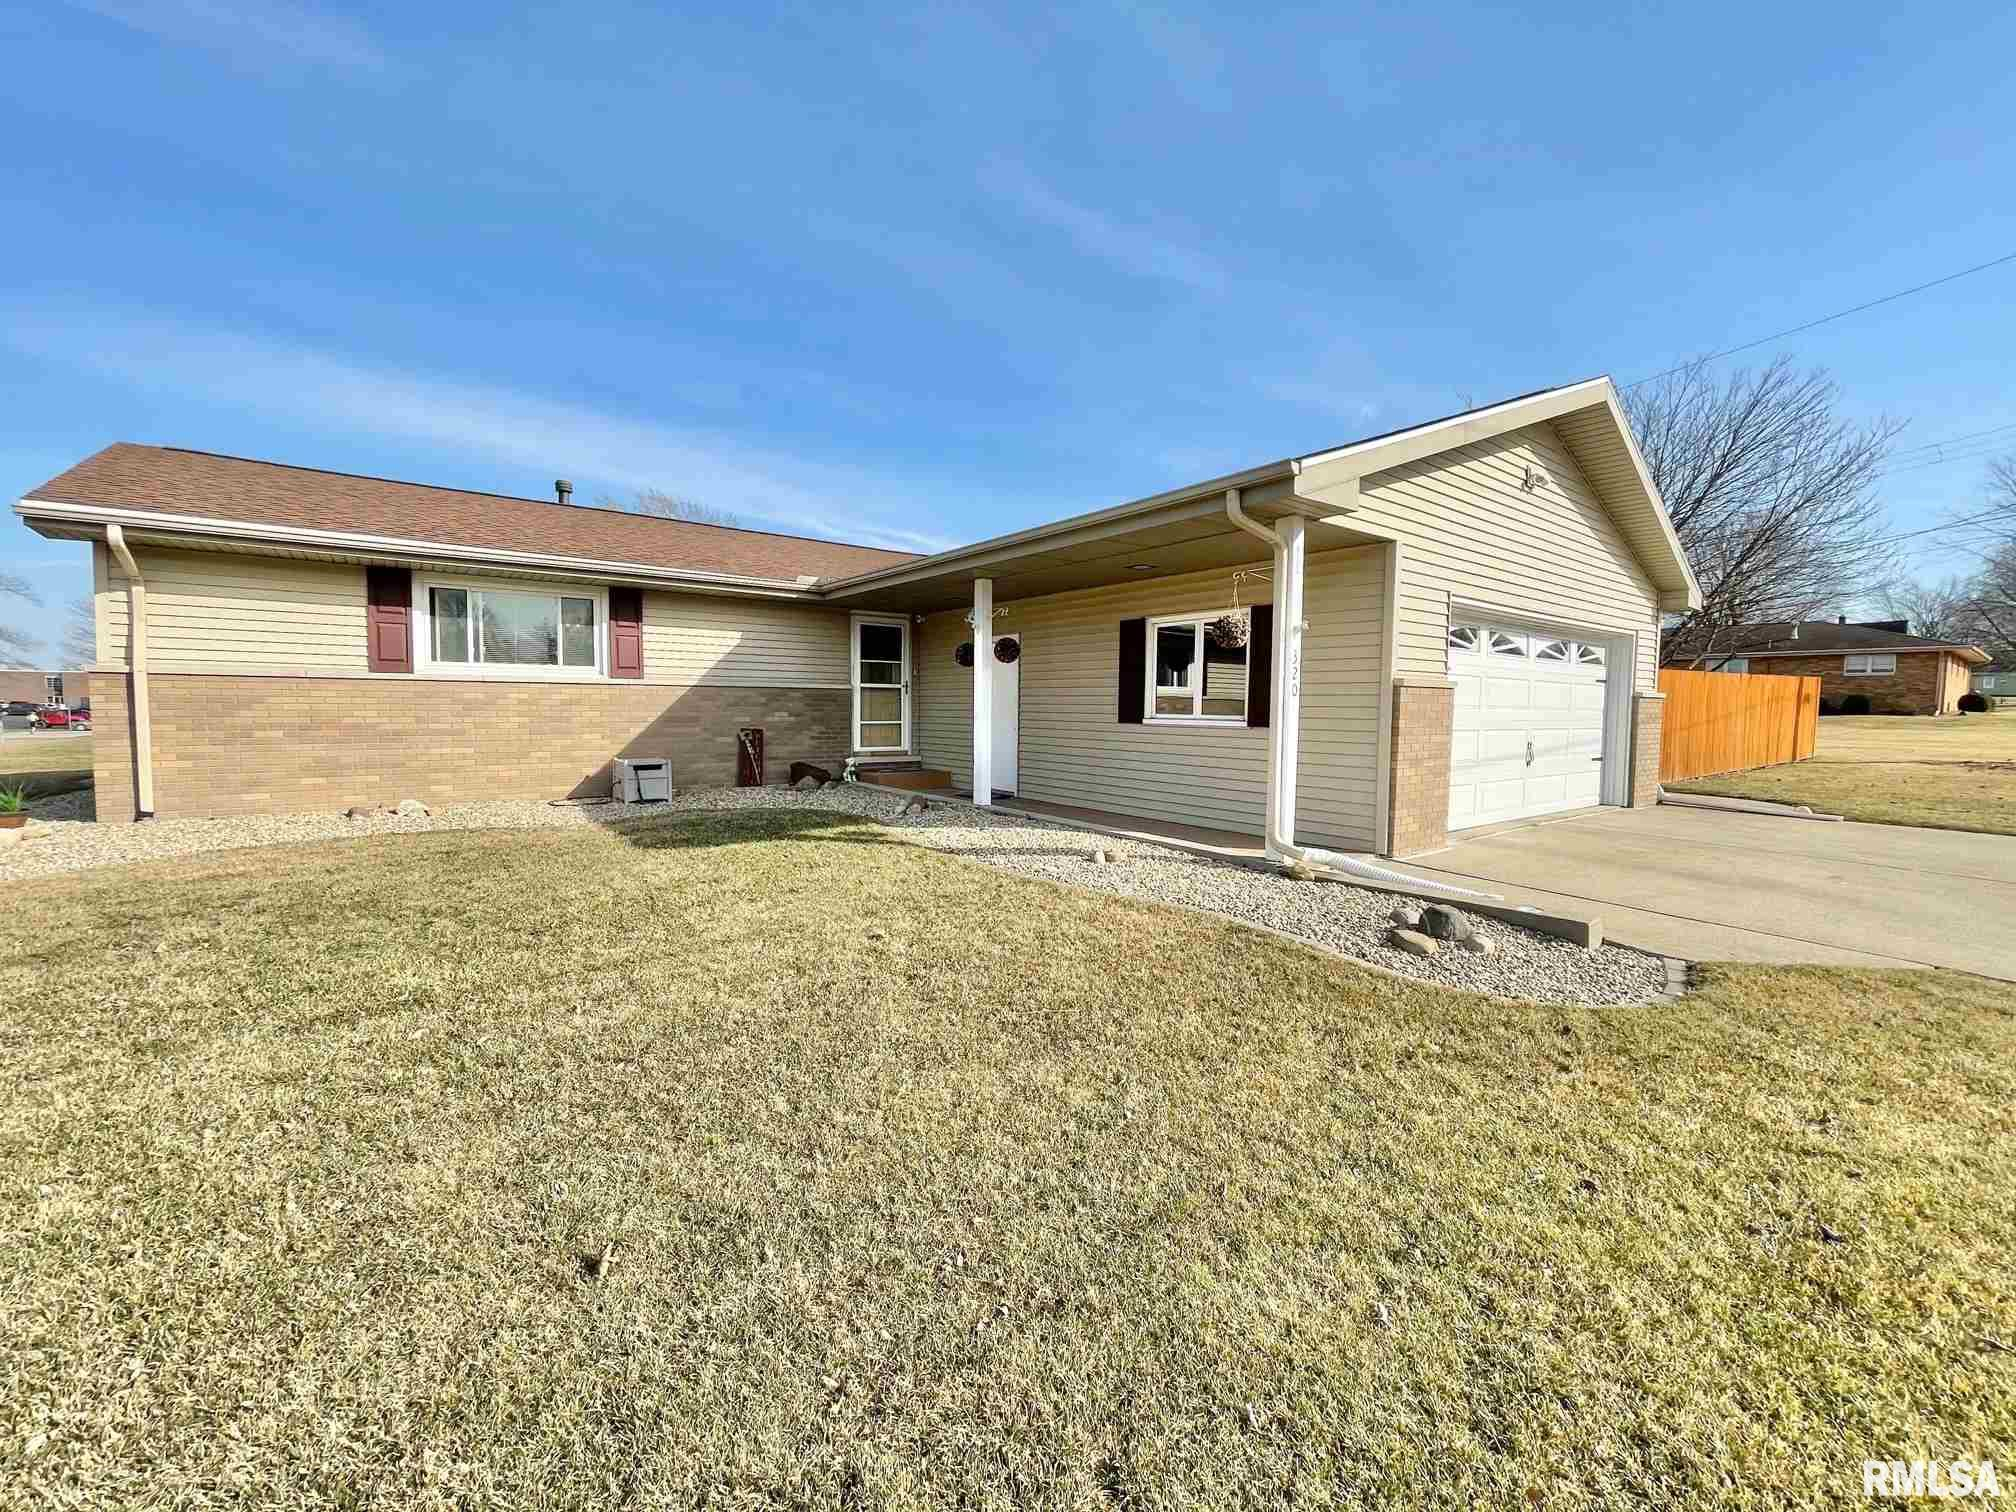 320 W MICHIGAN Property Photo - Metamora, IL real estate listing